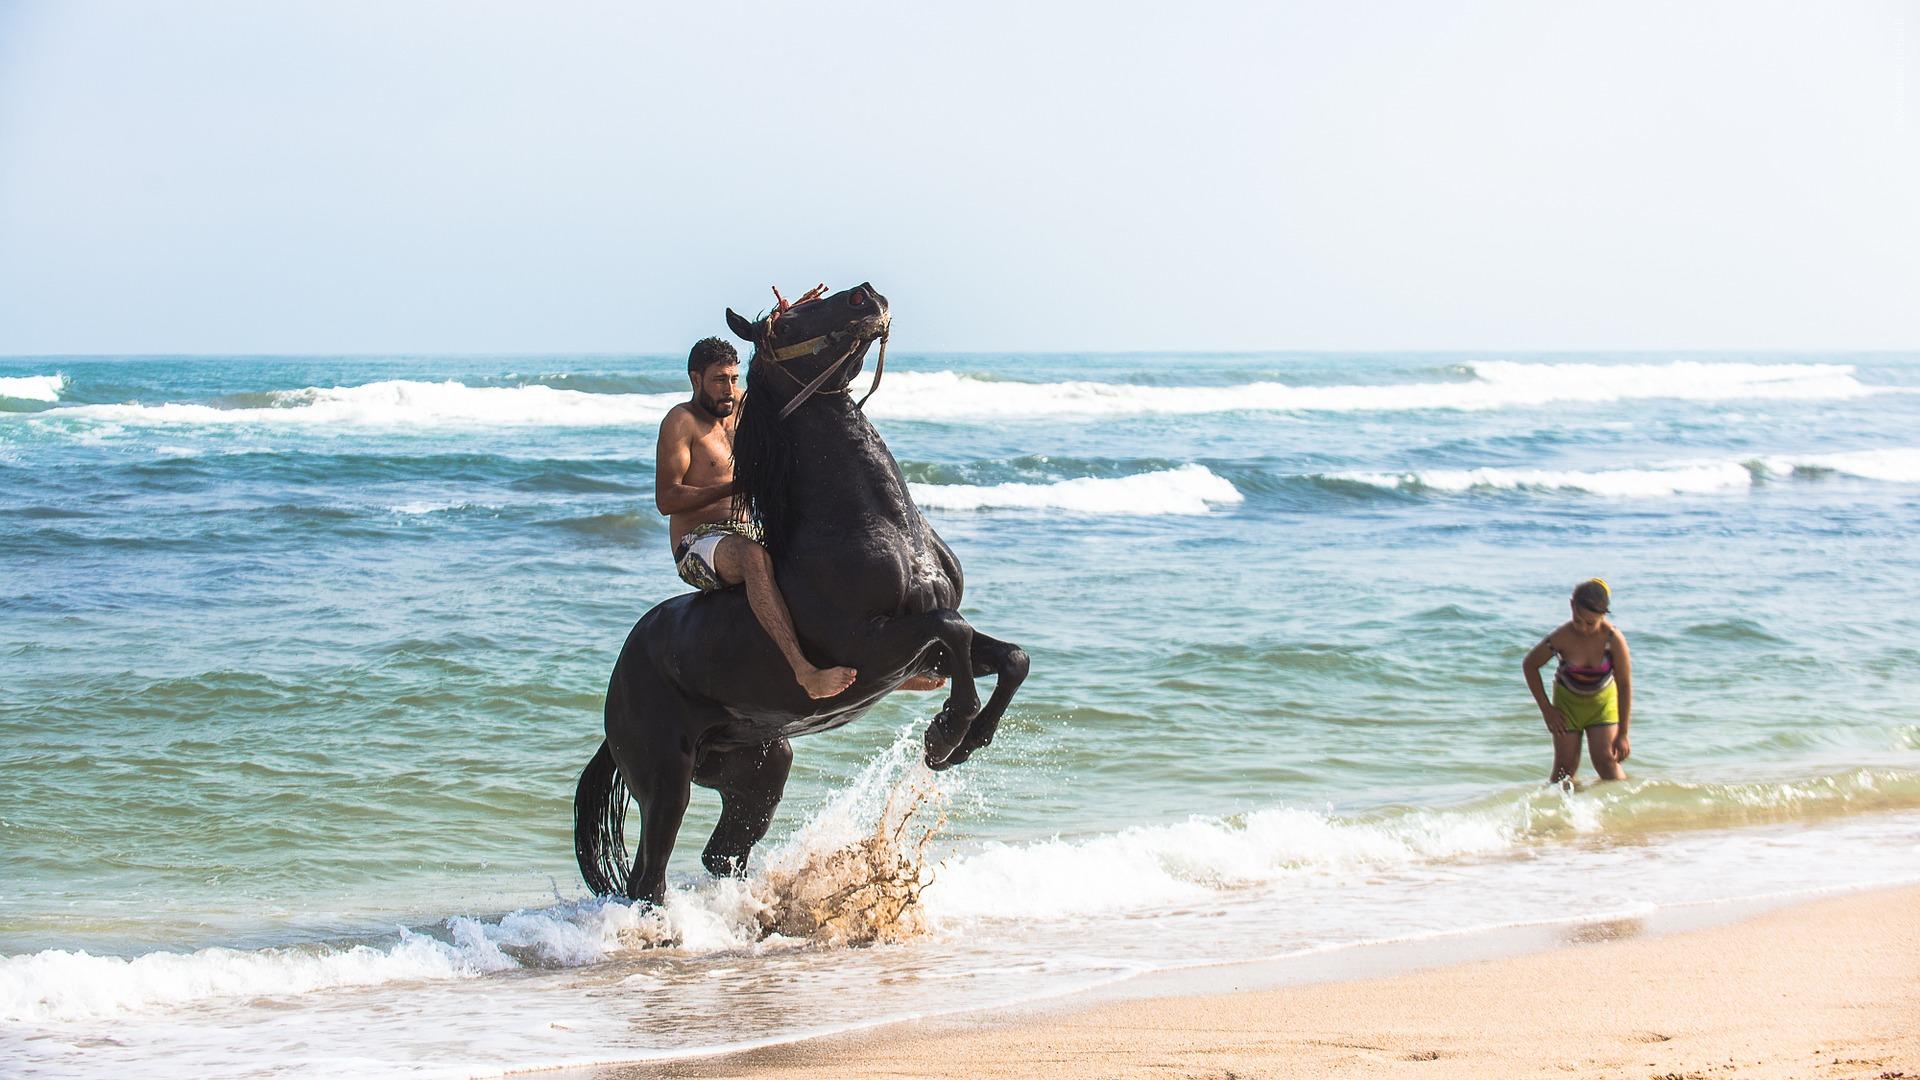 7 Tage Urlaub in Marokko Agadir günstig buchen ab 105,00€